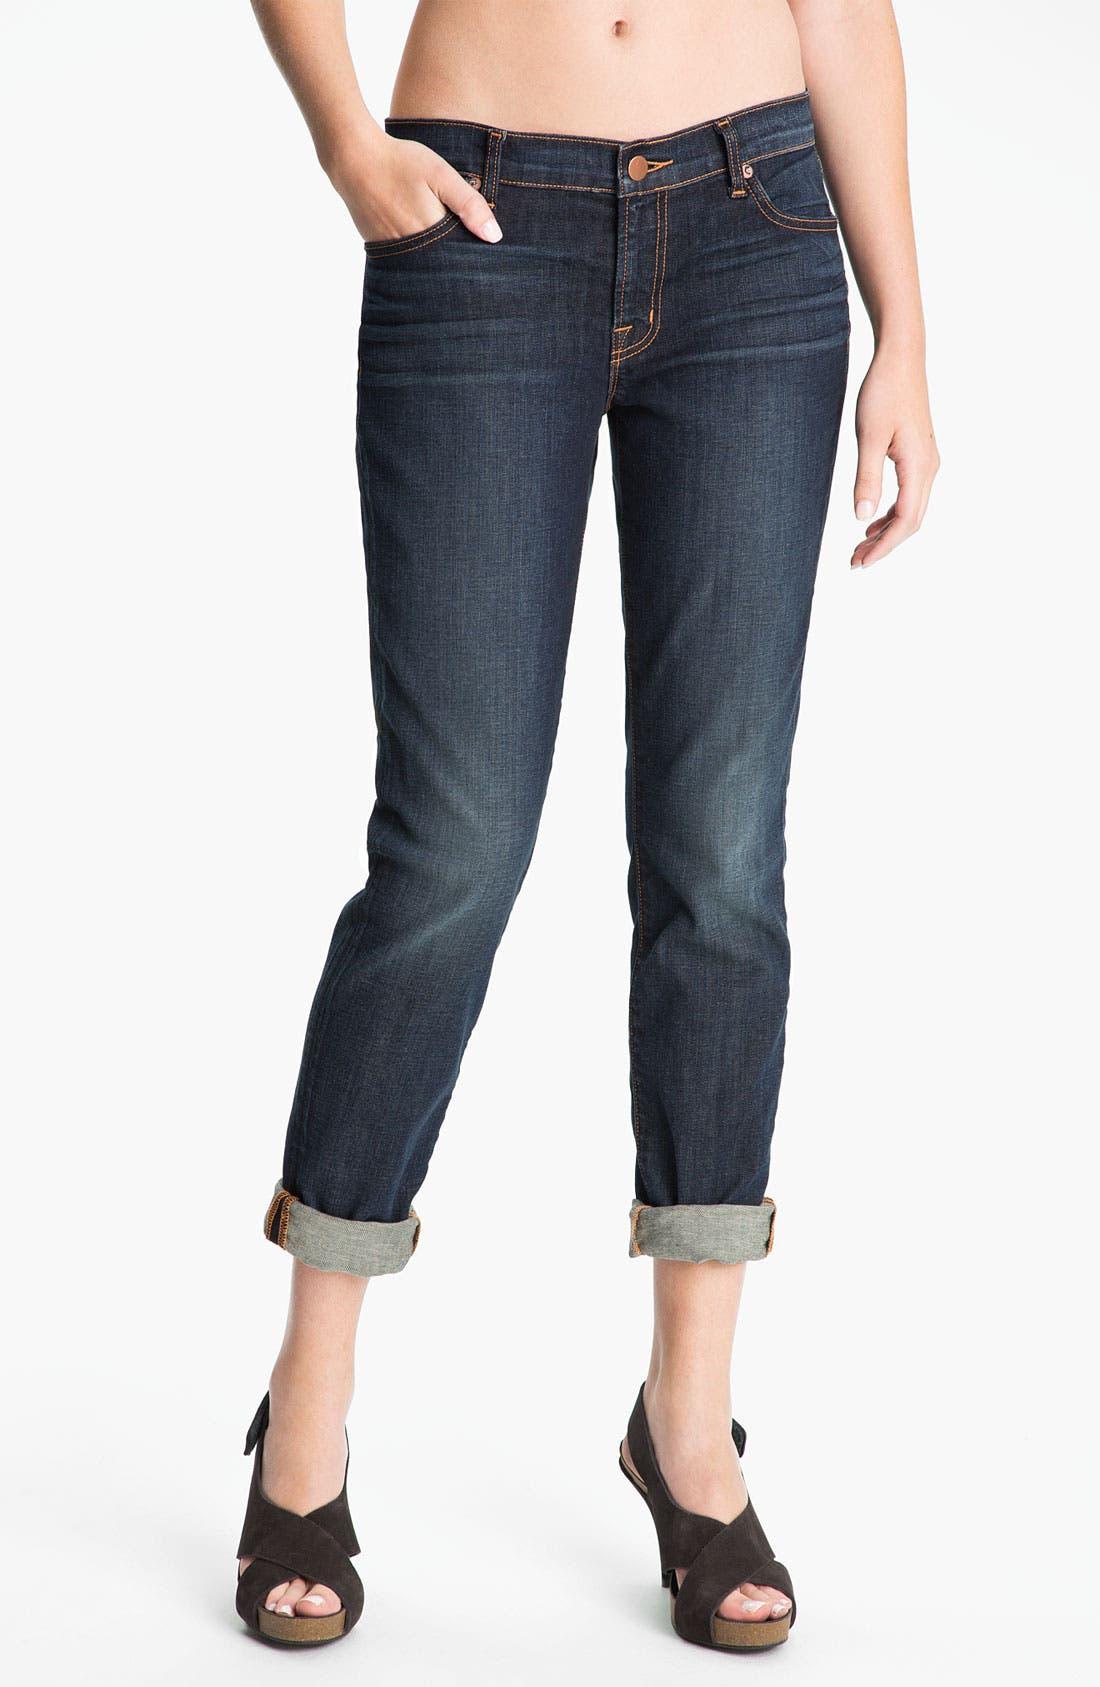 Alternate Image 1 Selected - J Brand 'Midori' Stretch Jeans (Dark Vintage)